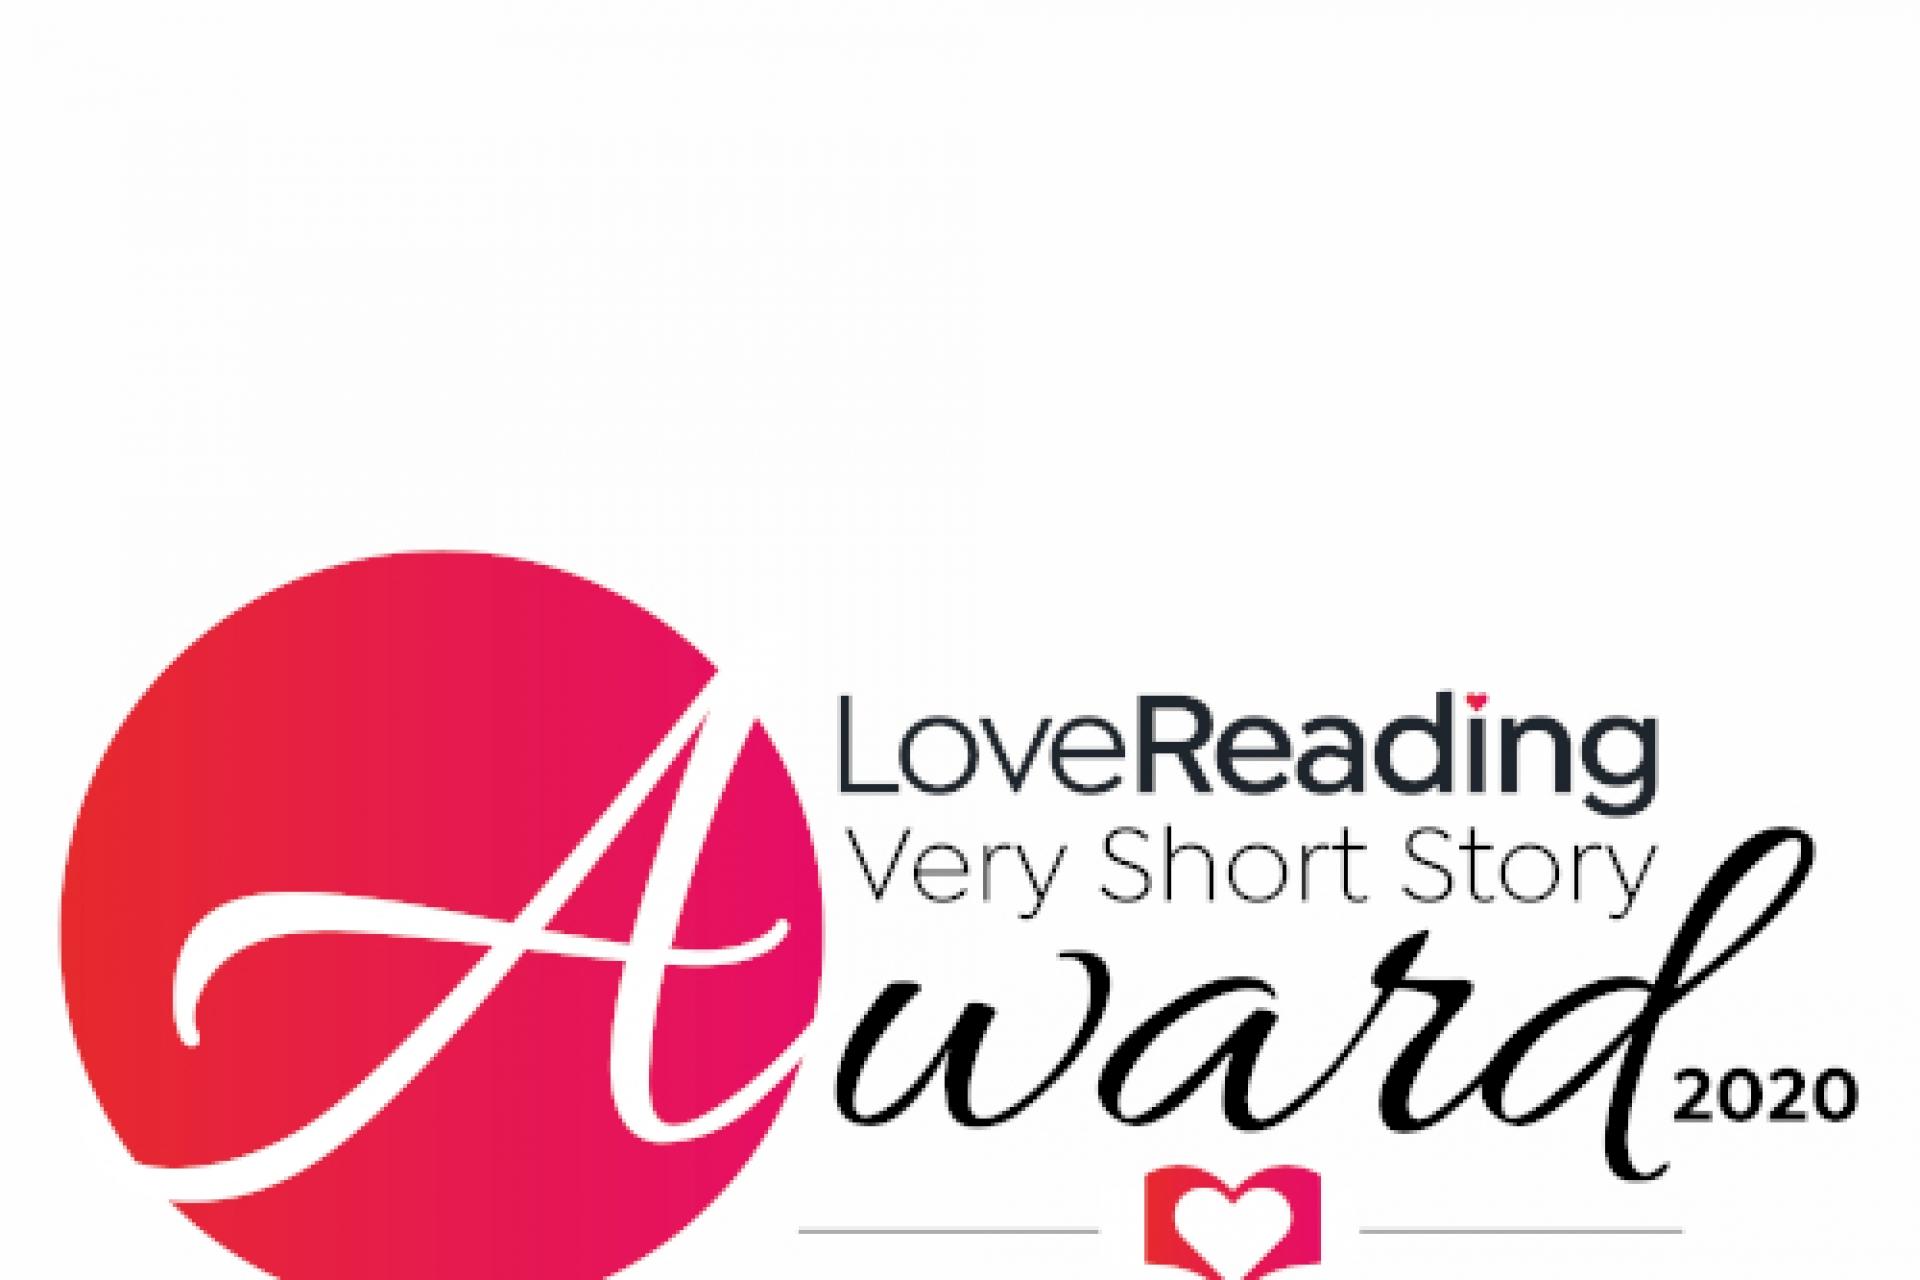 LoveReading Very Short Story Award 2020